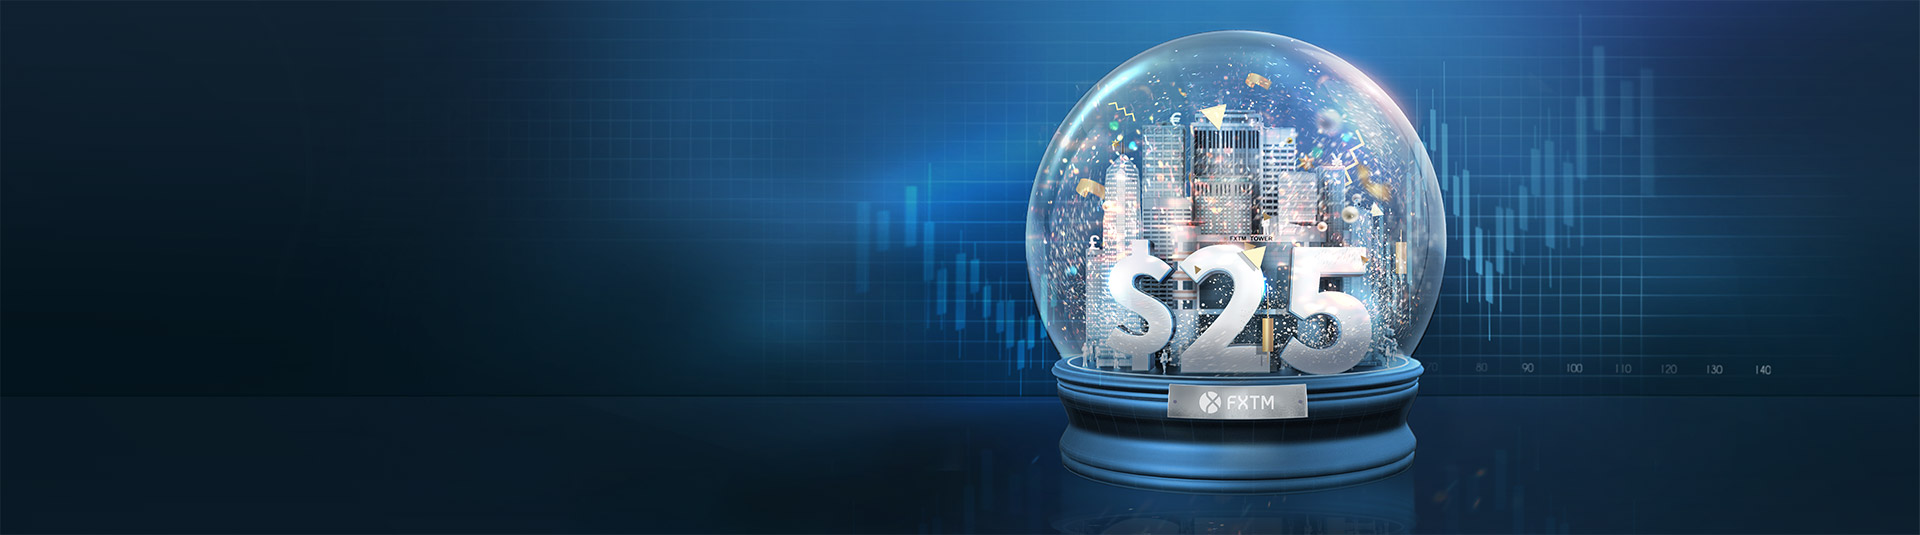 New year forex no deposit bonus